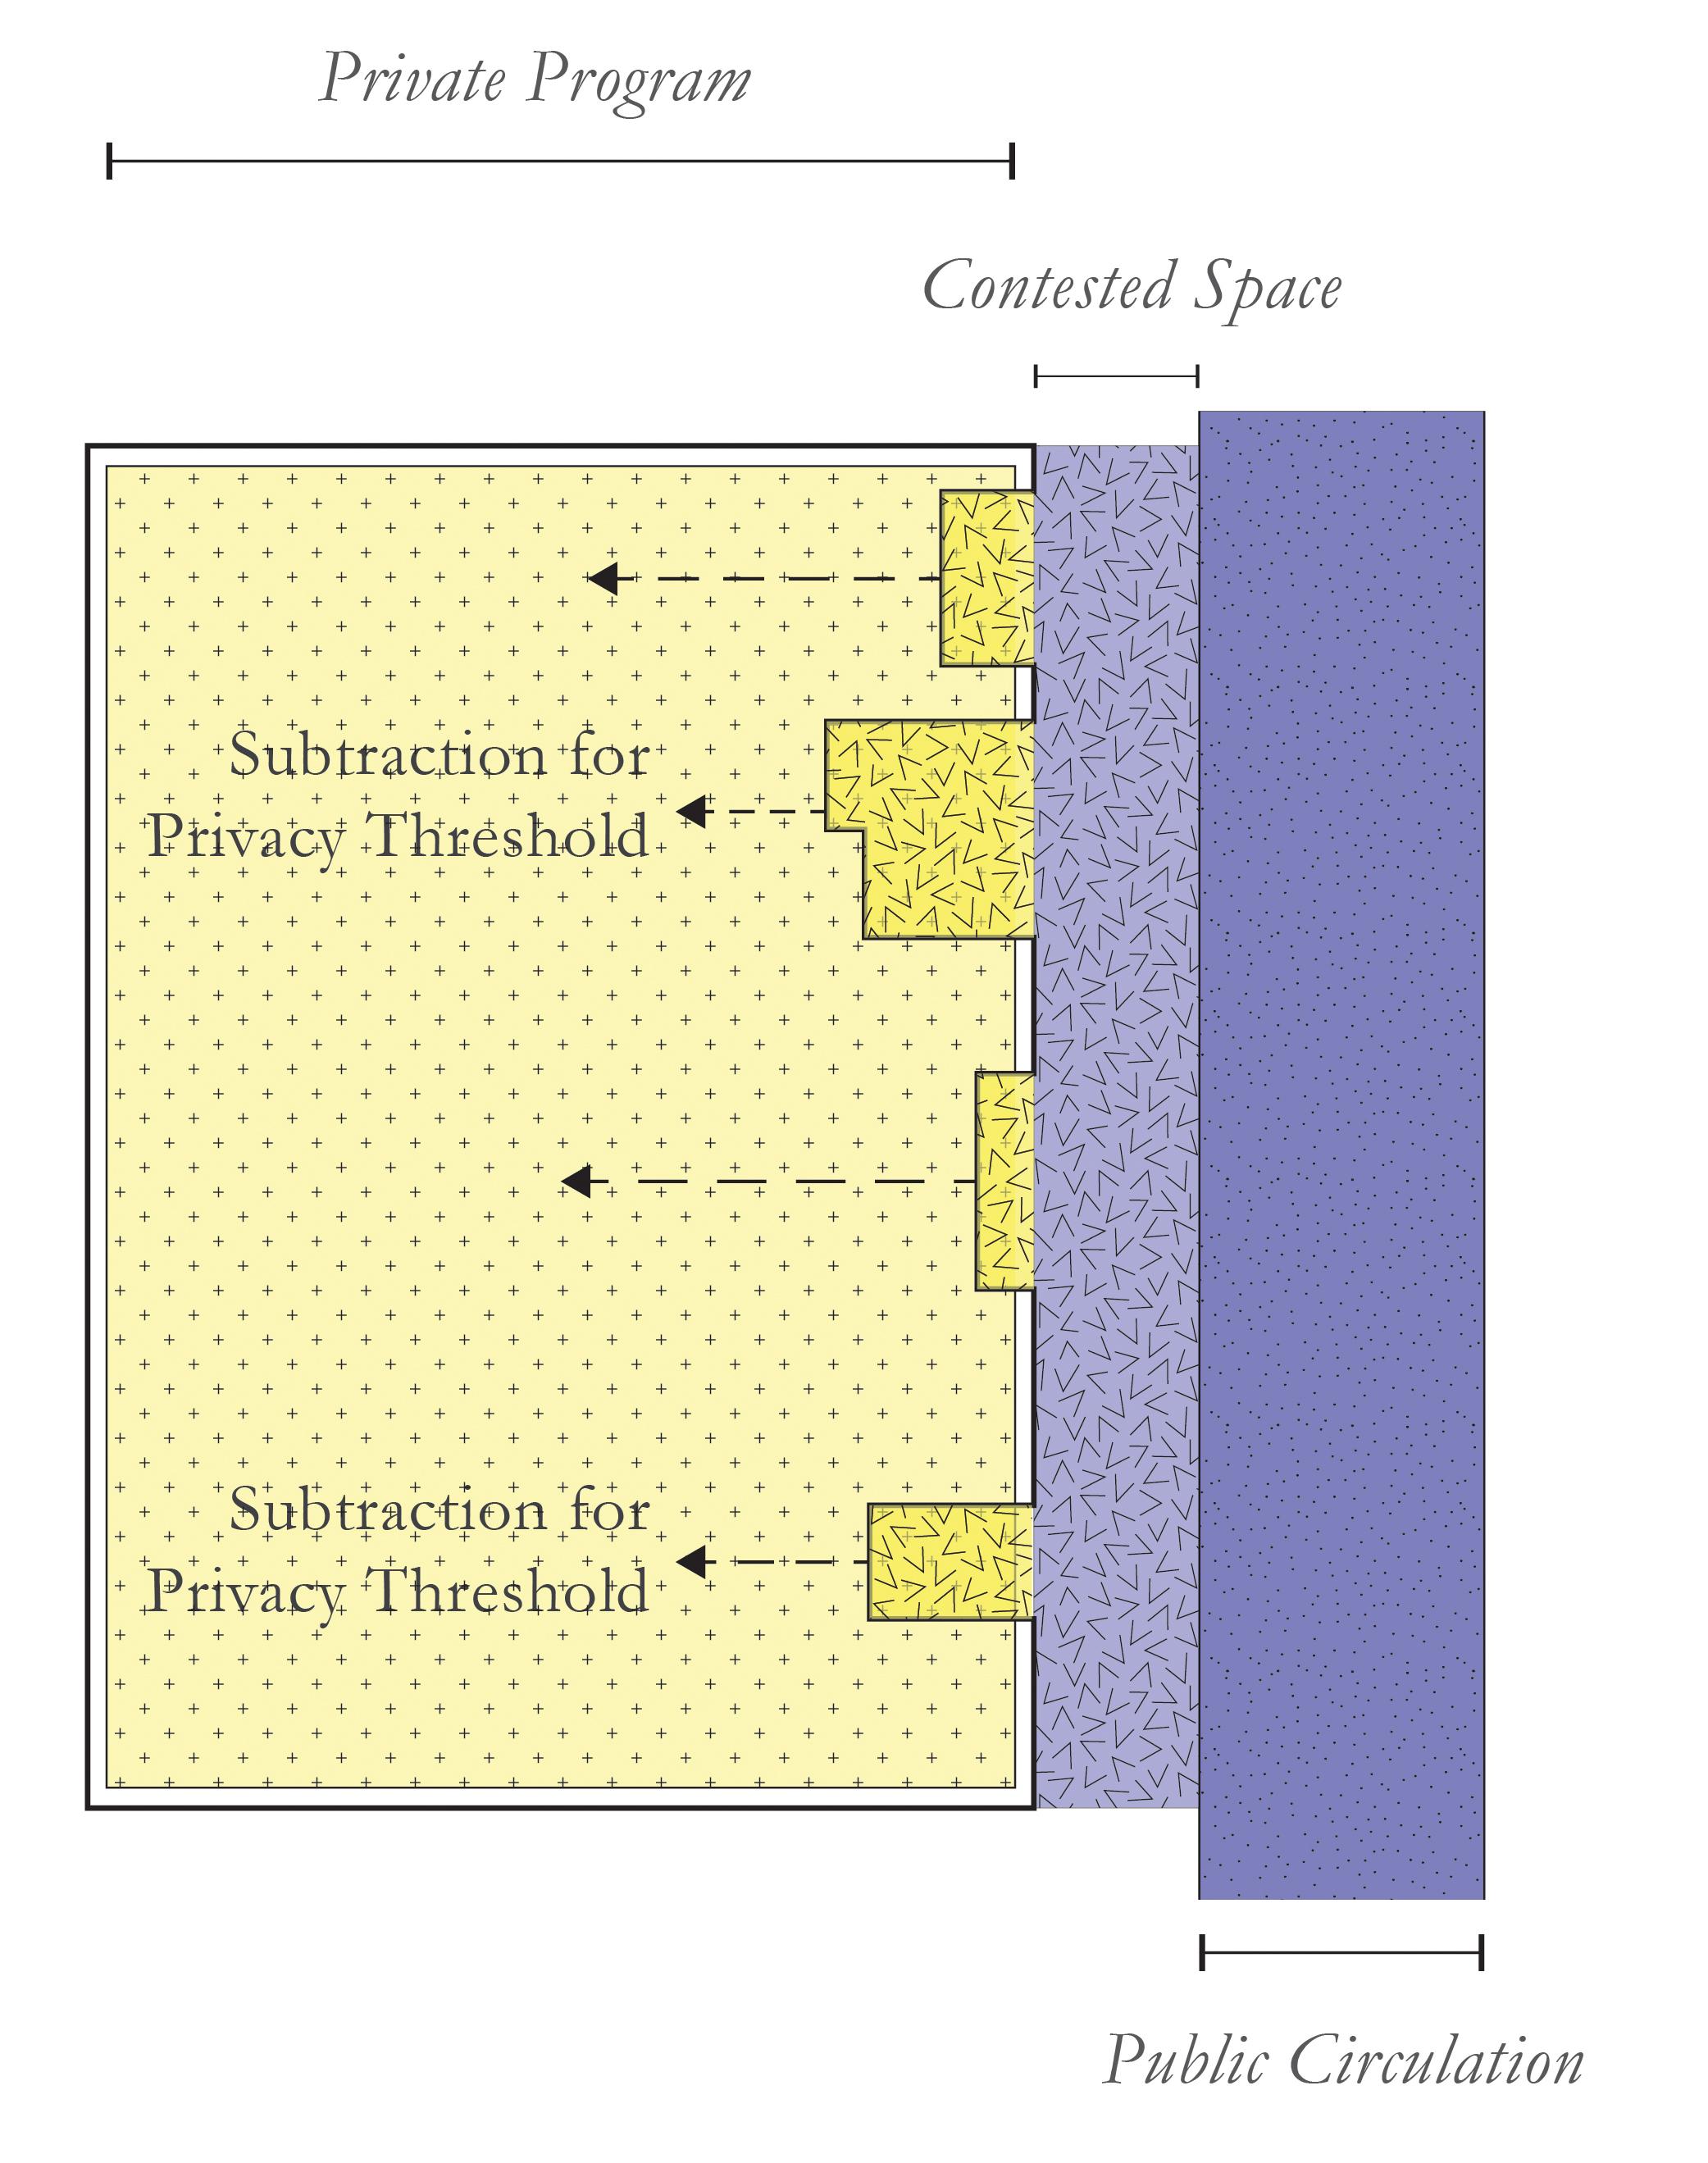 Formal Rules Diagrams1.small.jpg